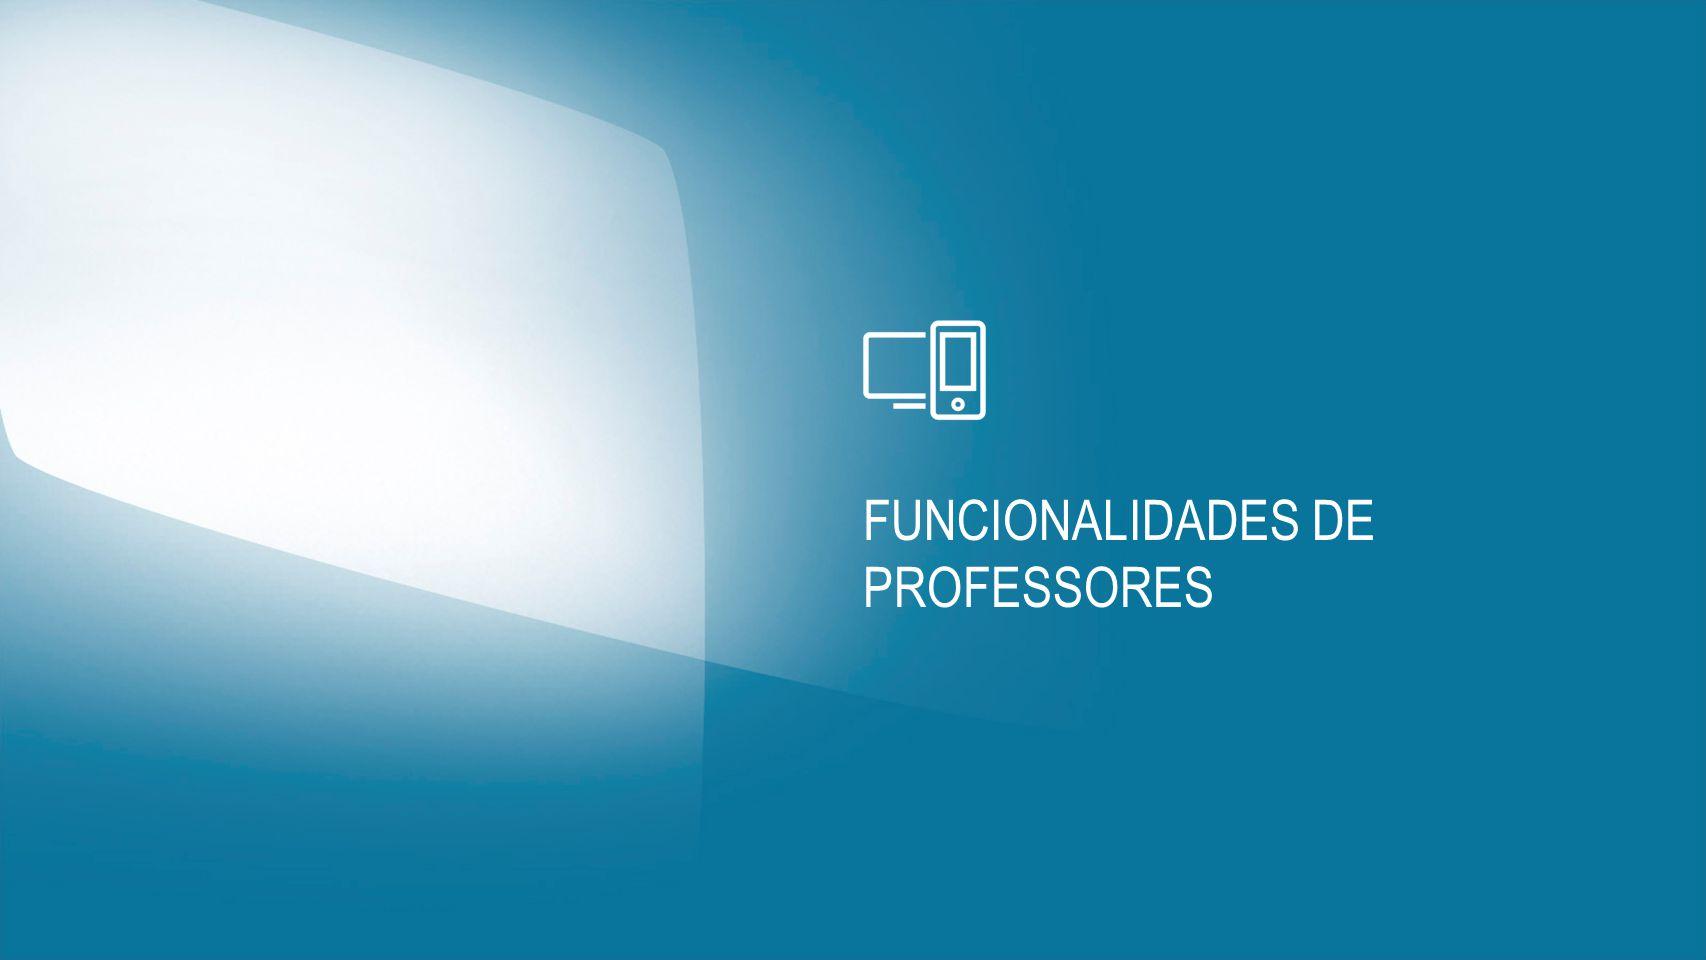 FUNCIONALIDADES DE PROFESSORES